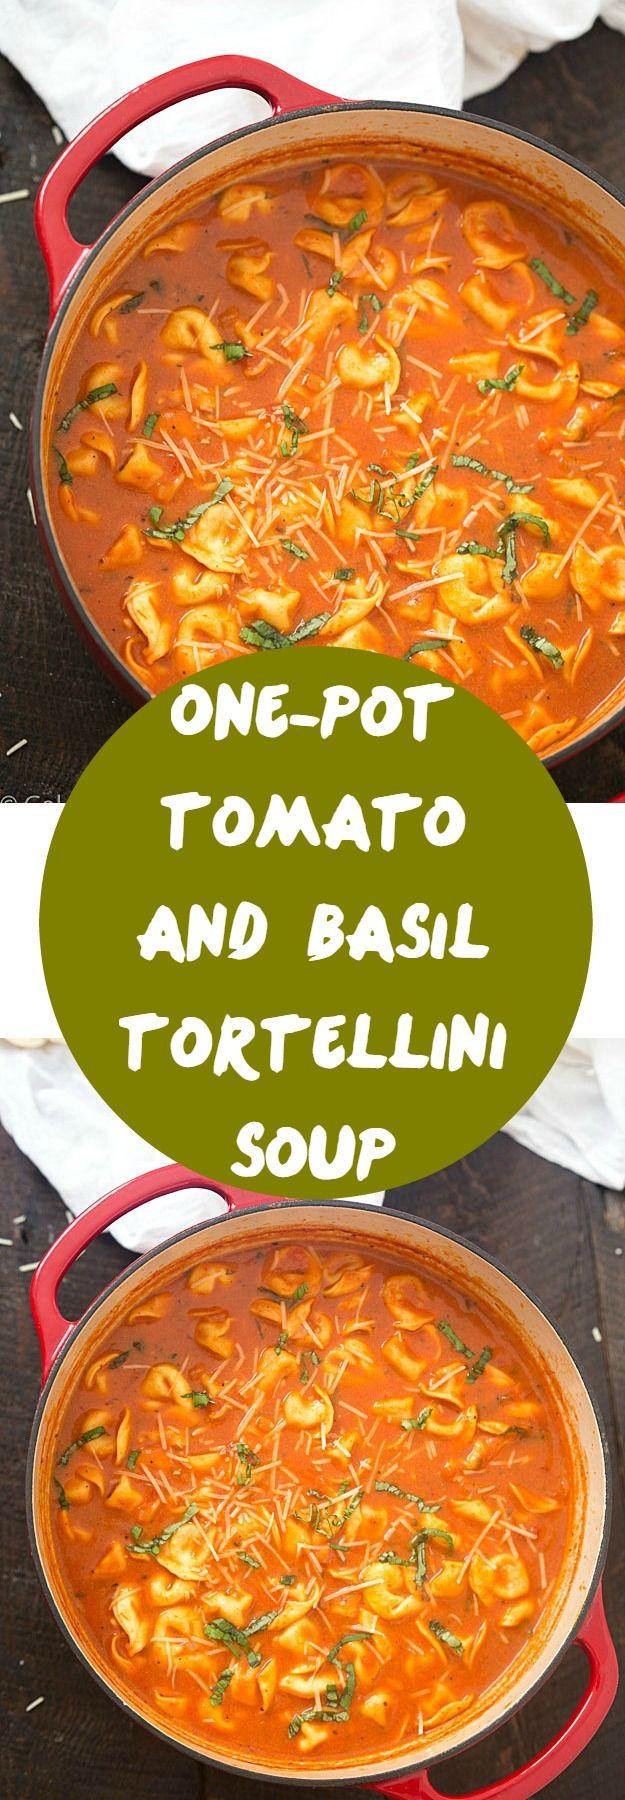 one-pot tomato and basil tortellini soup -